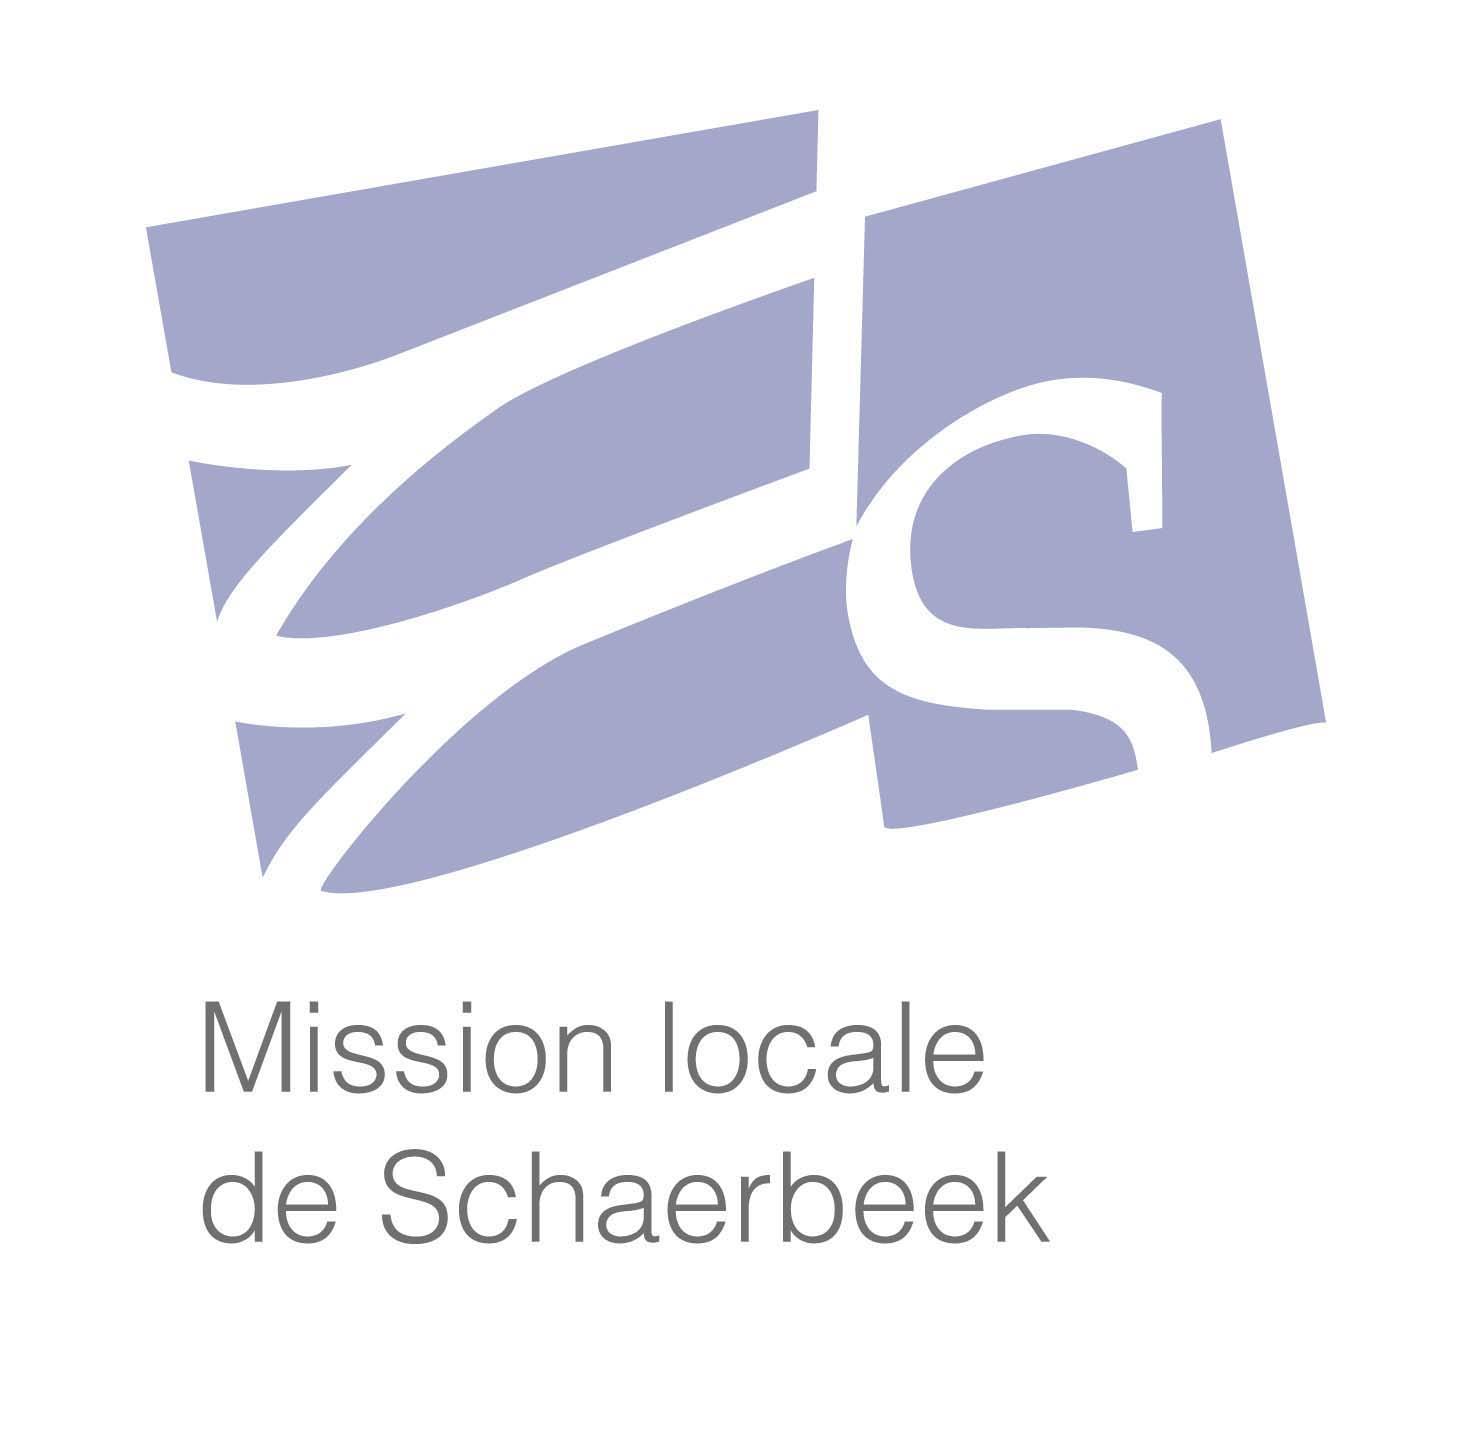 logo mission locale schaerbeek